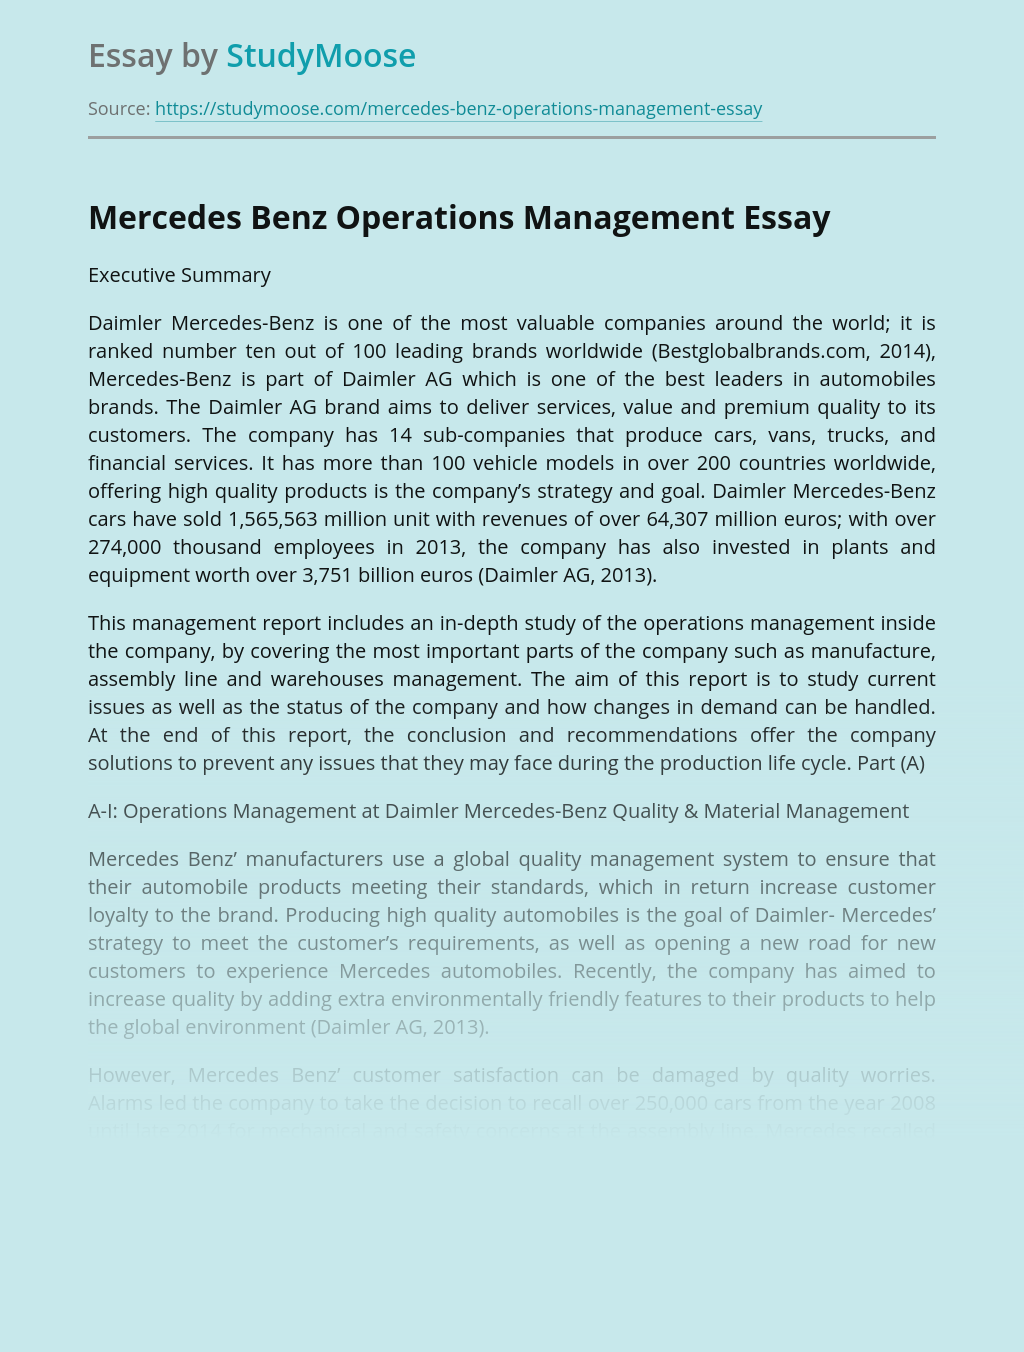 Mercedes Benz Operations Management